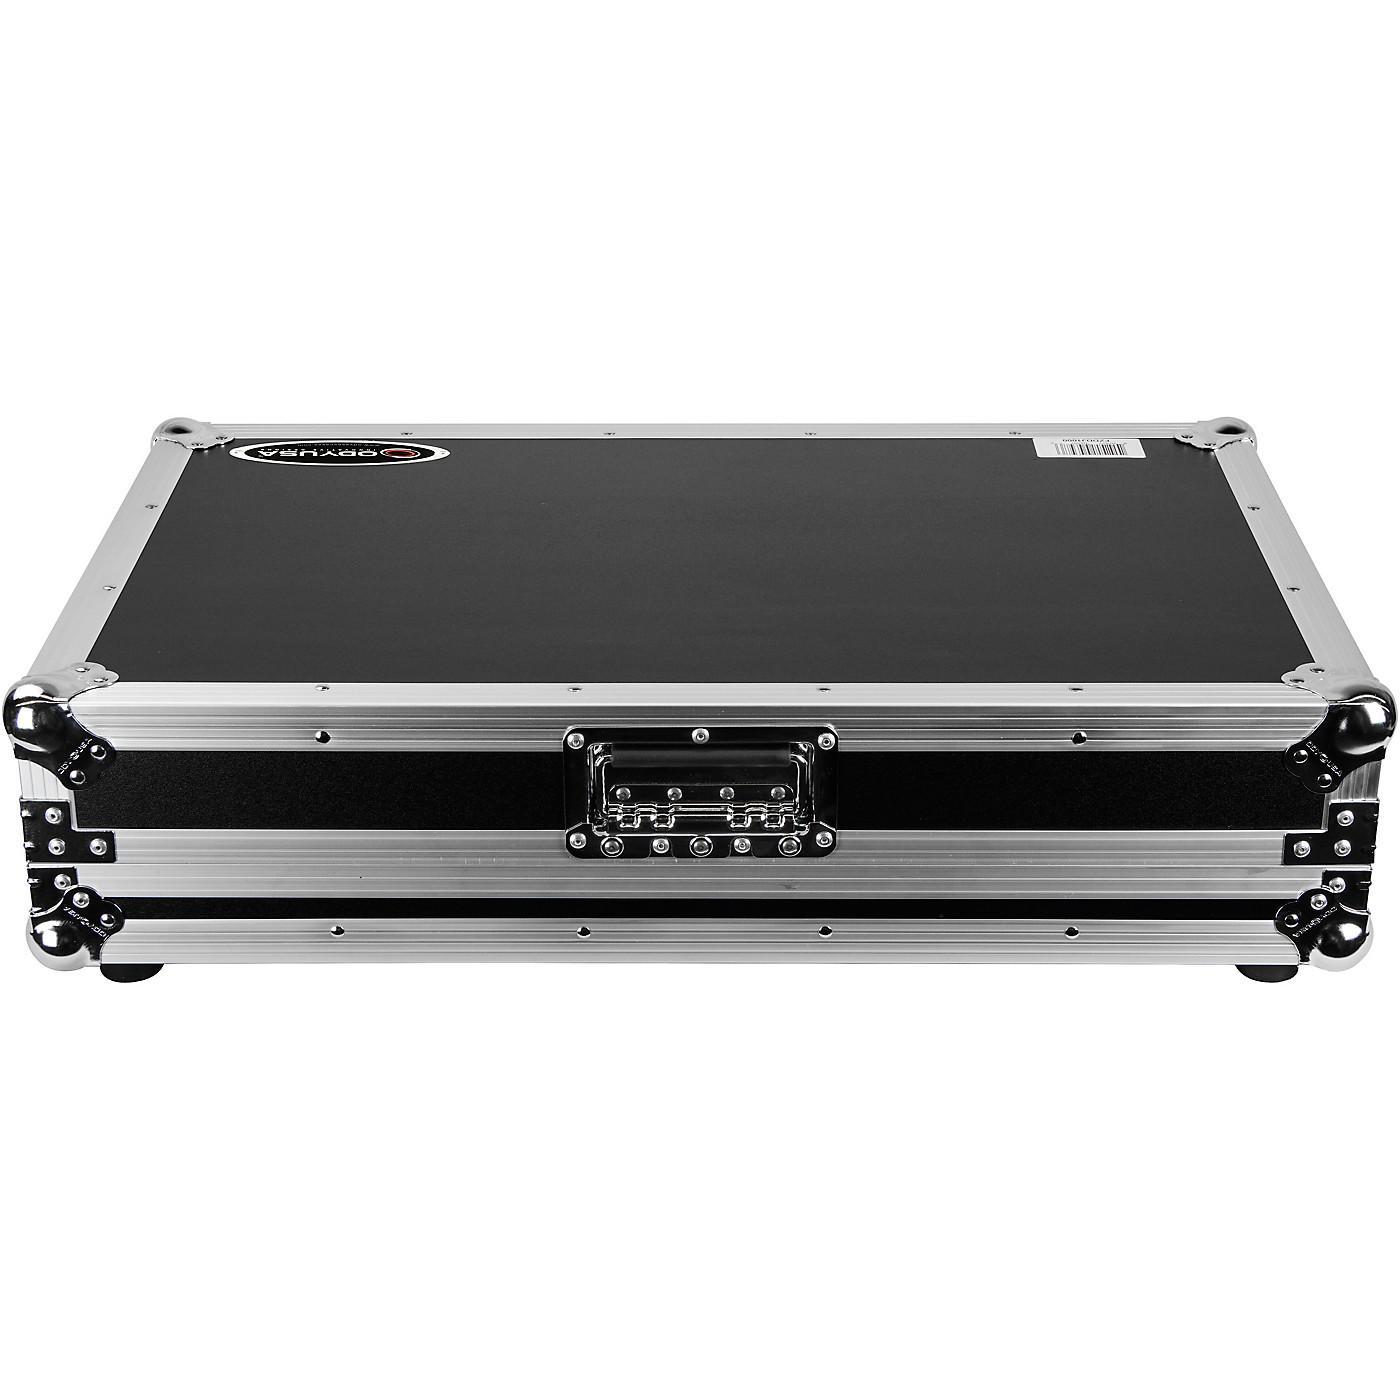 Odyssey FZDDJ1000 Flight Zone Low Profile Series Pioneer DDJ-1000 DJ Controller Case thumbnail